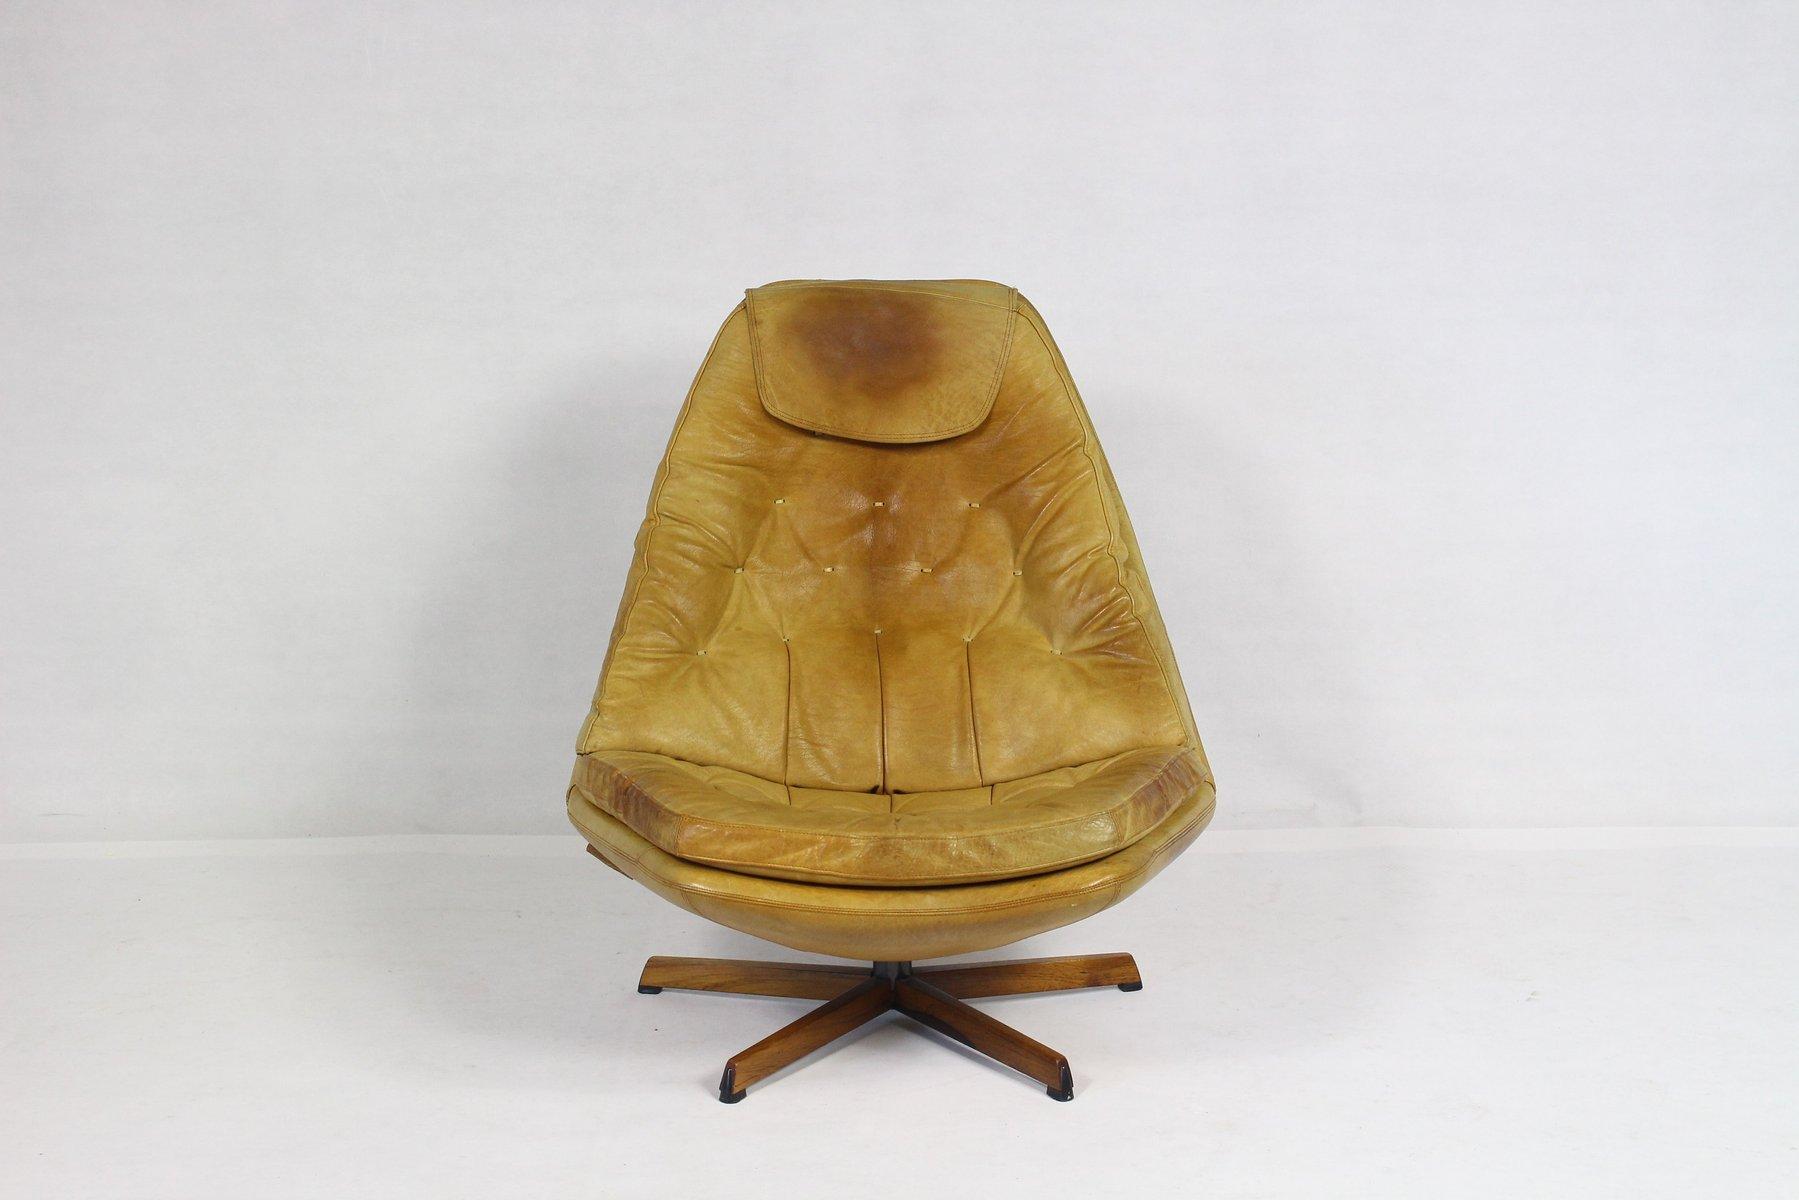 vintage ledersessel ottoman von madsen schubell f r bovenkamp bei pamono kaufen. Black Bedroom Furniture Sets. Home Design Ideas